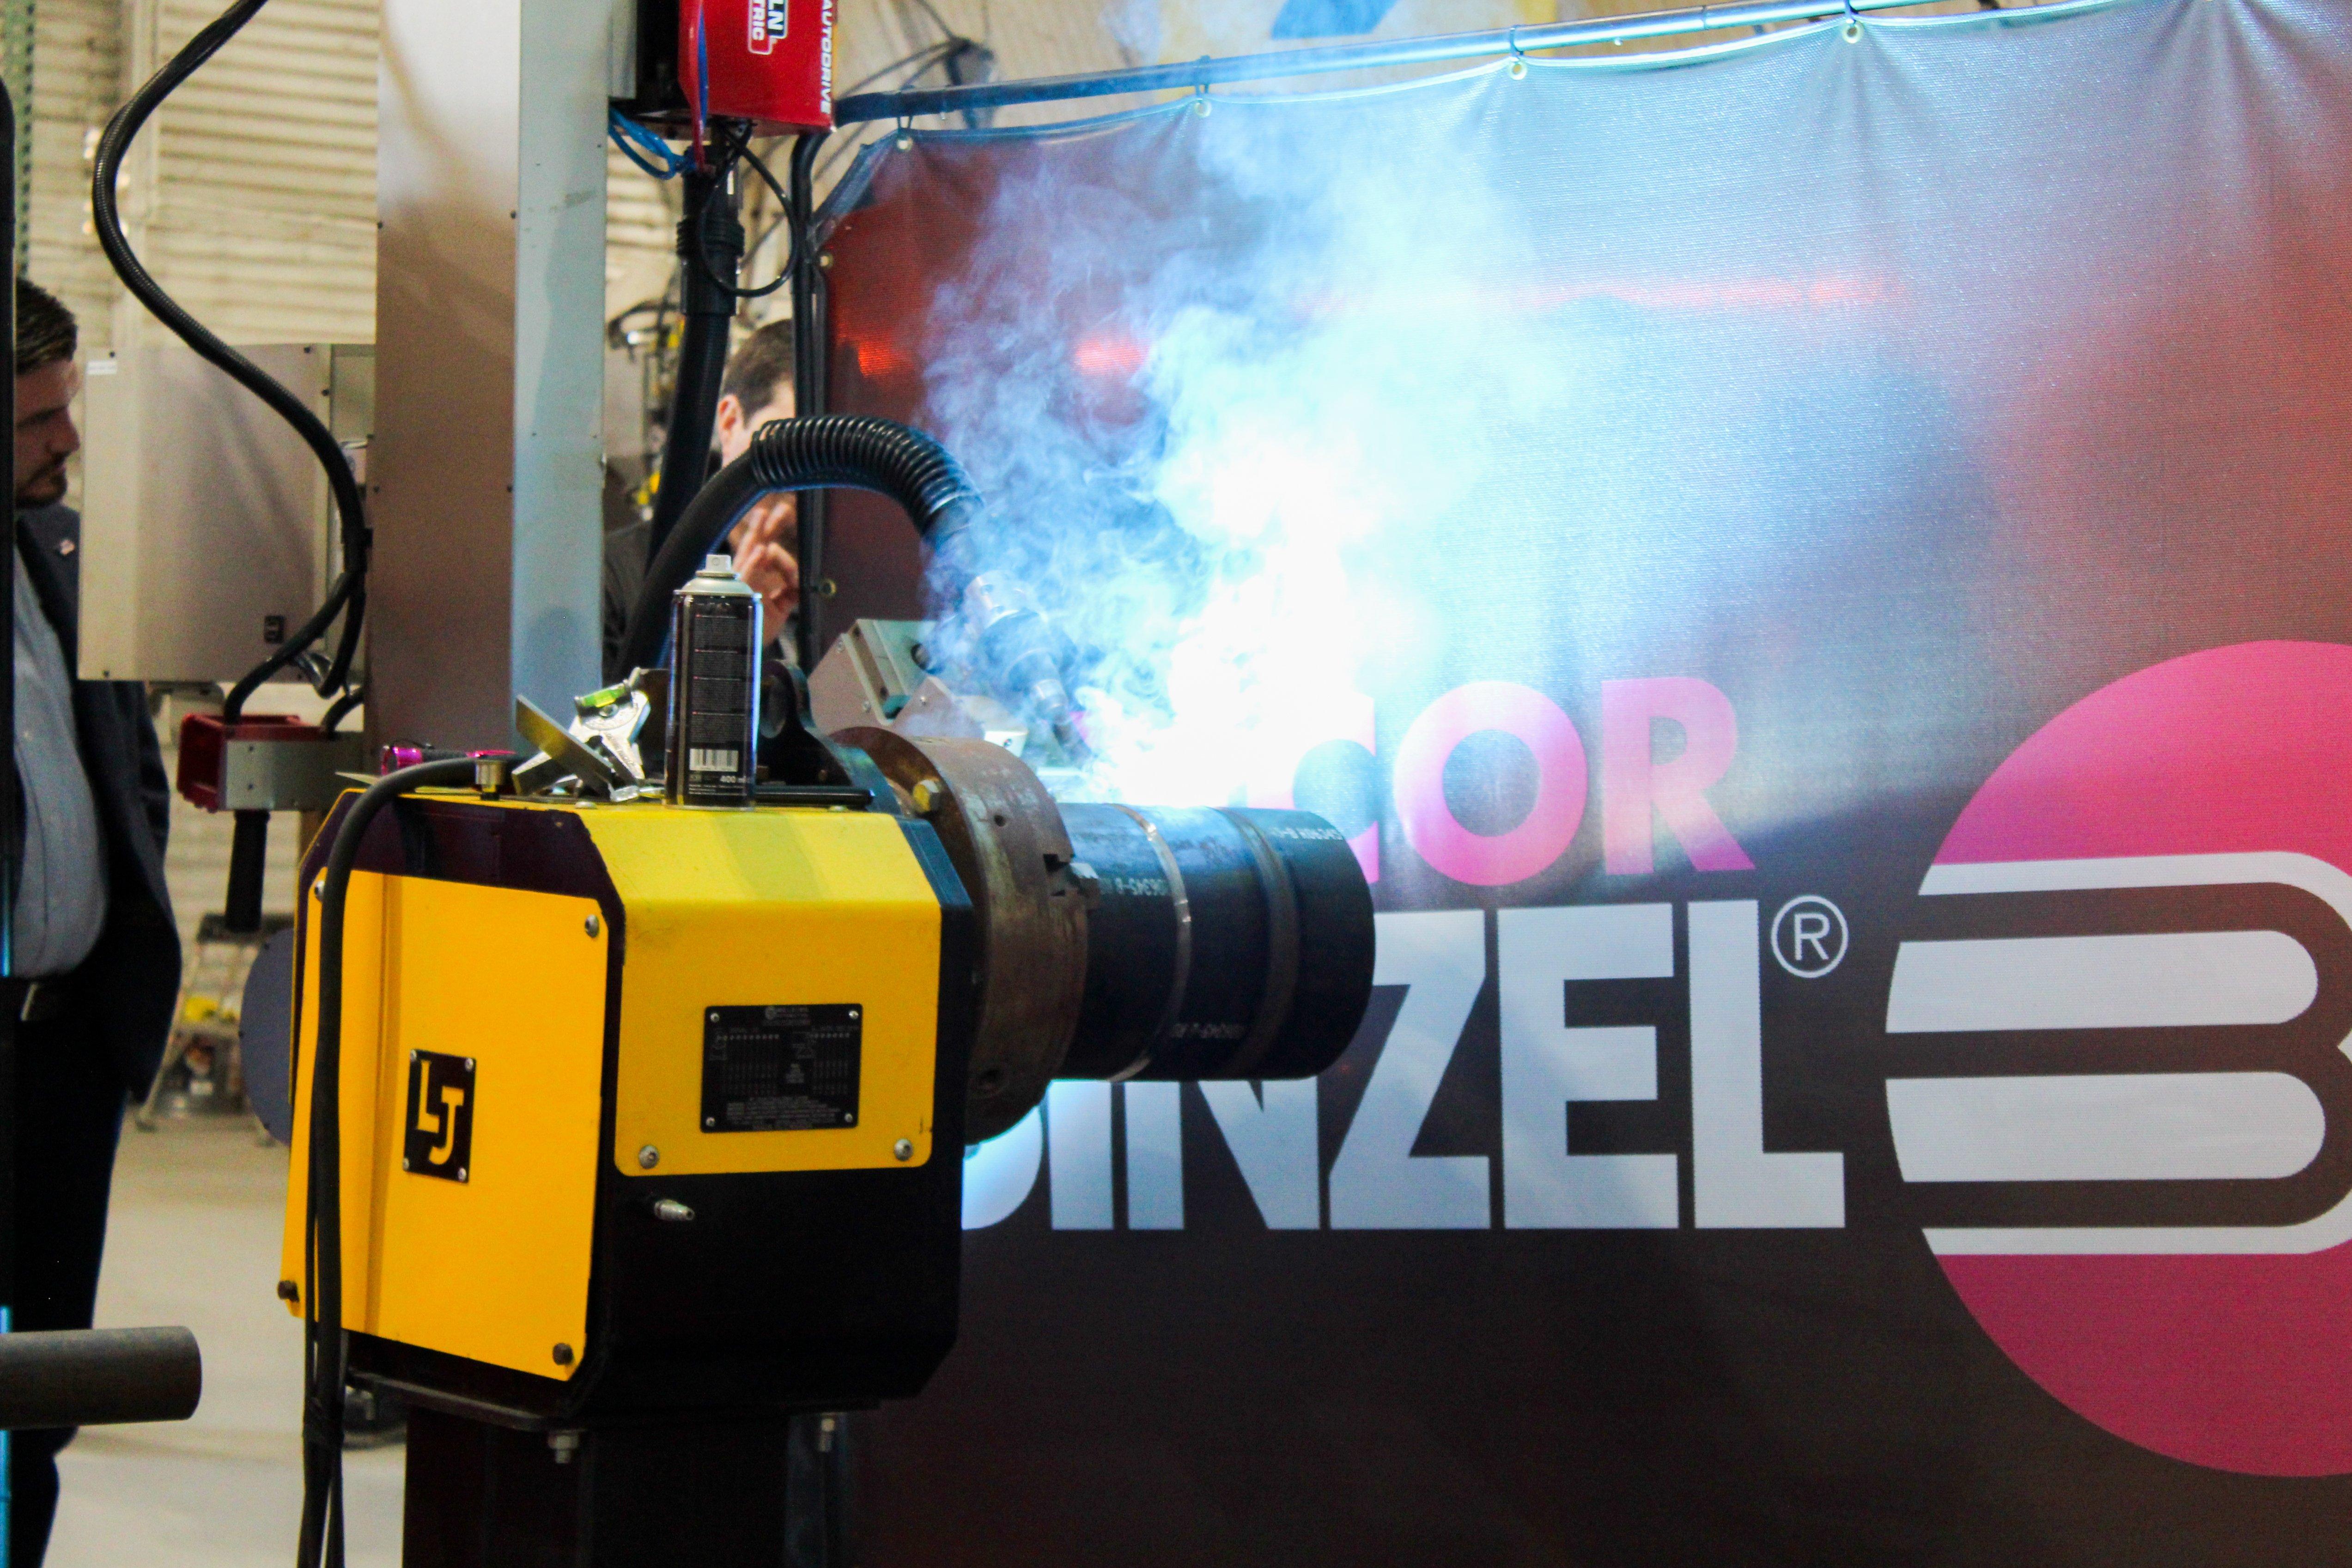 The Novarc Spool Welding Robot in action